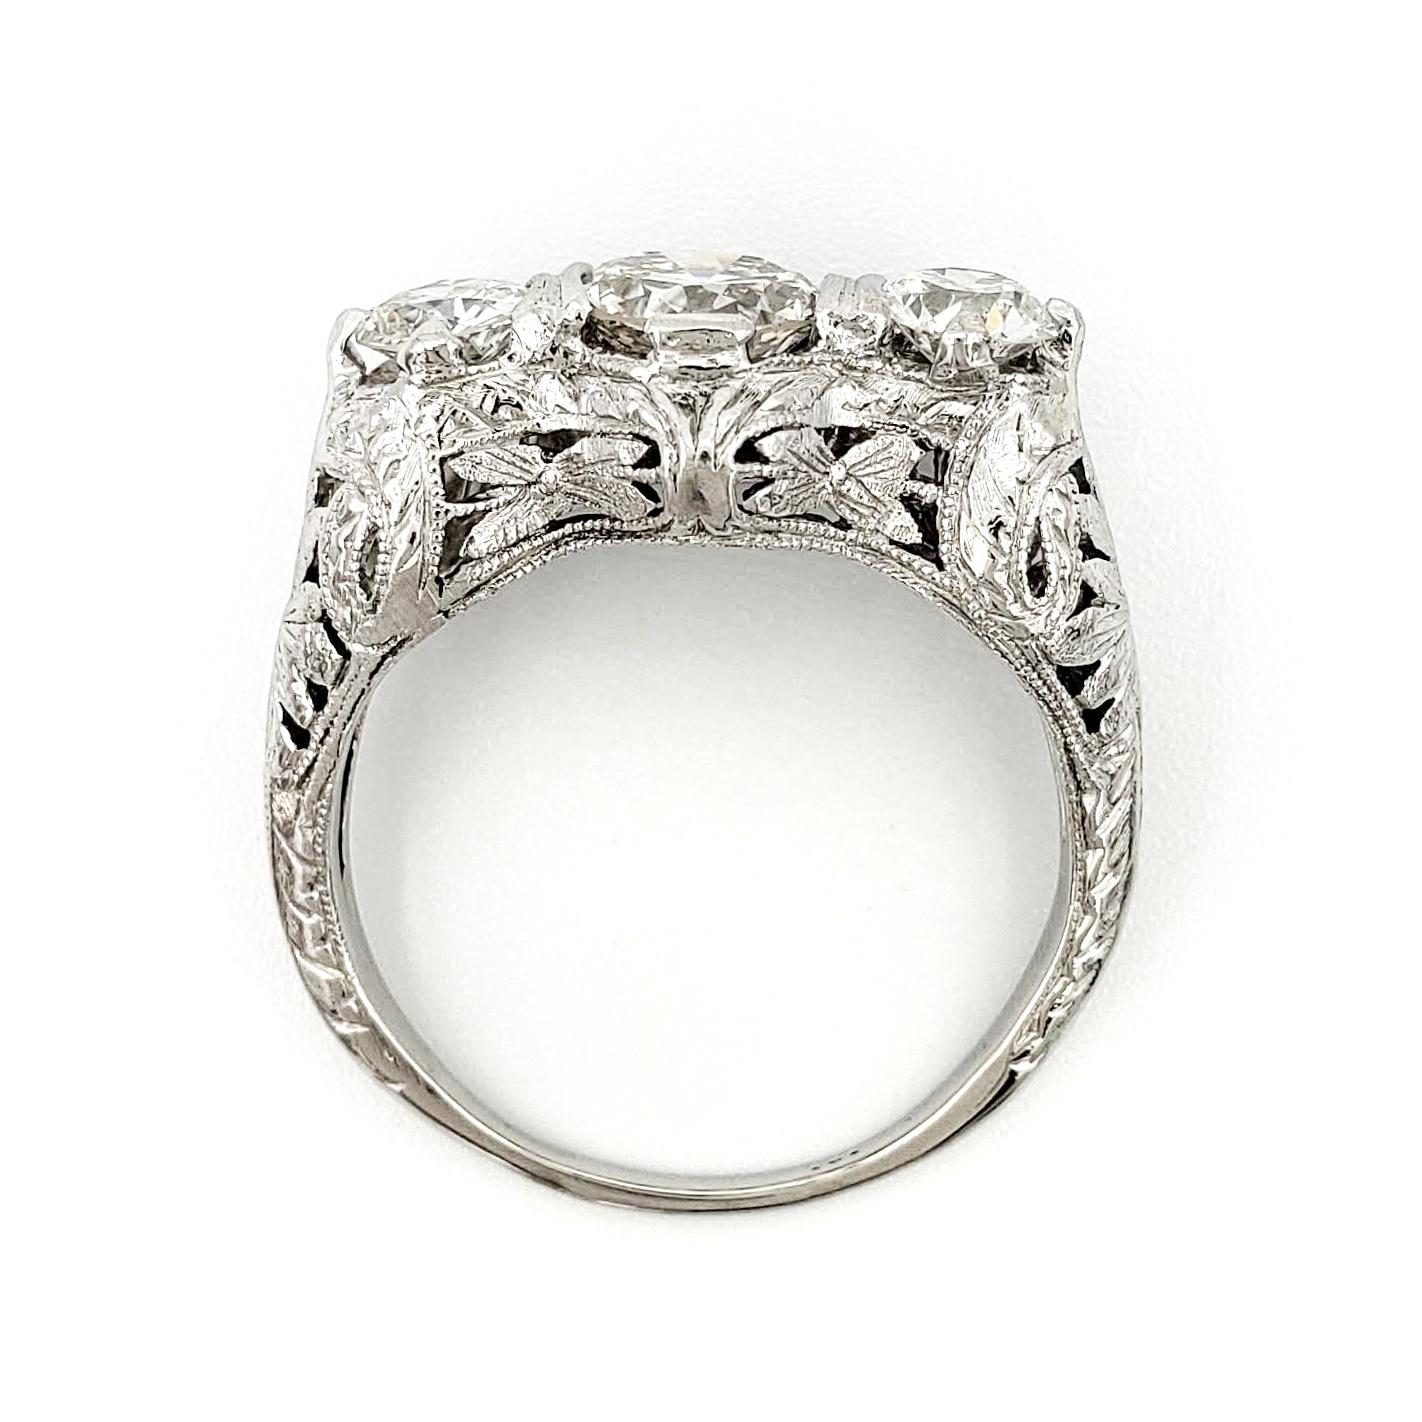 vintage-platinum-engagement-ring-with-0-83-carat-old-european-cut-diamond-egl-h-si1